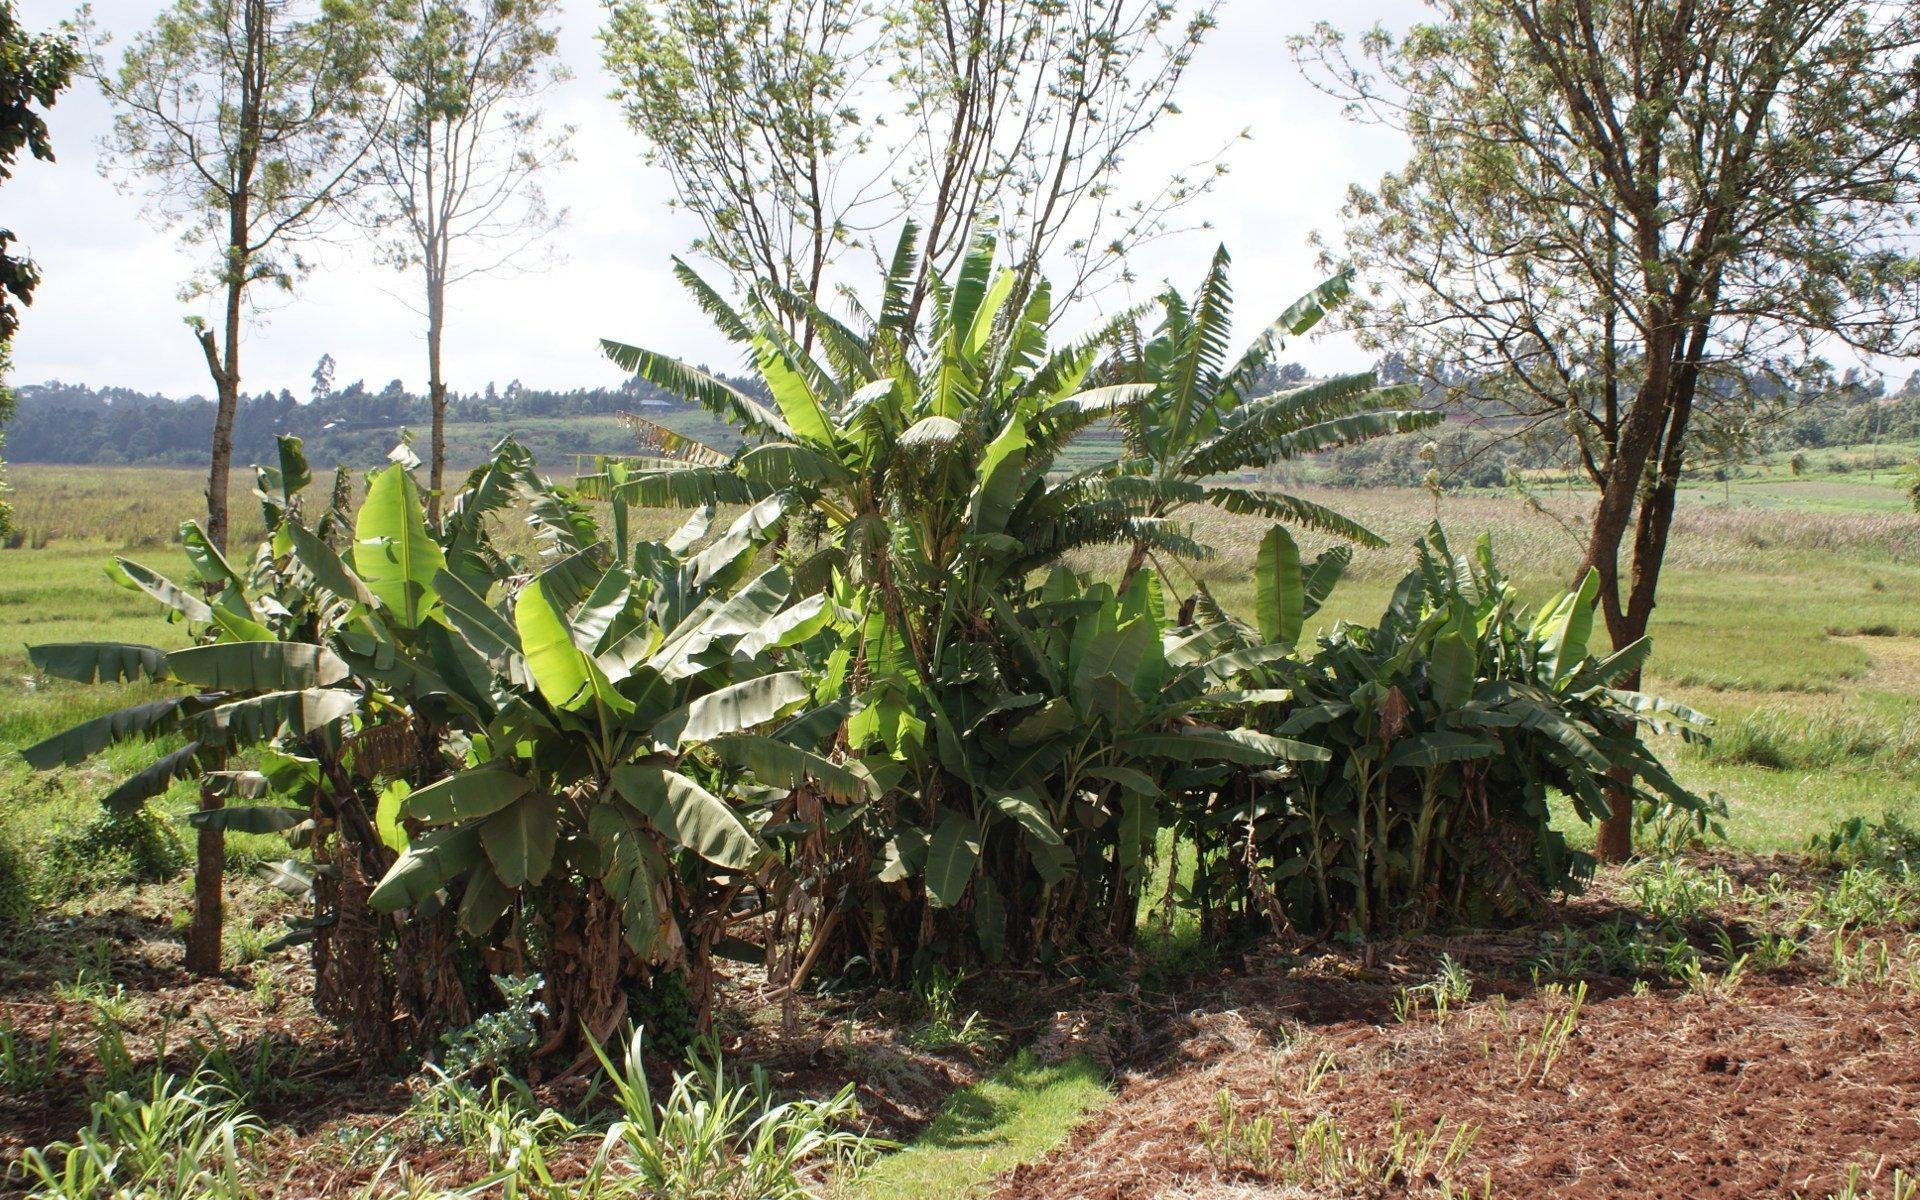 How farmers are encroaching into Ondiri Swamp.